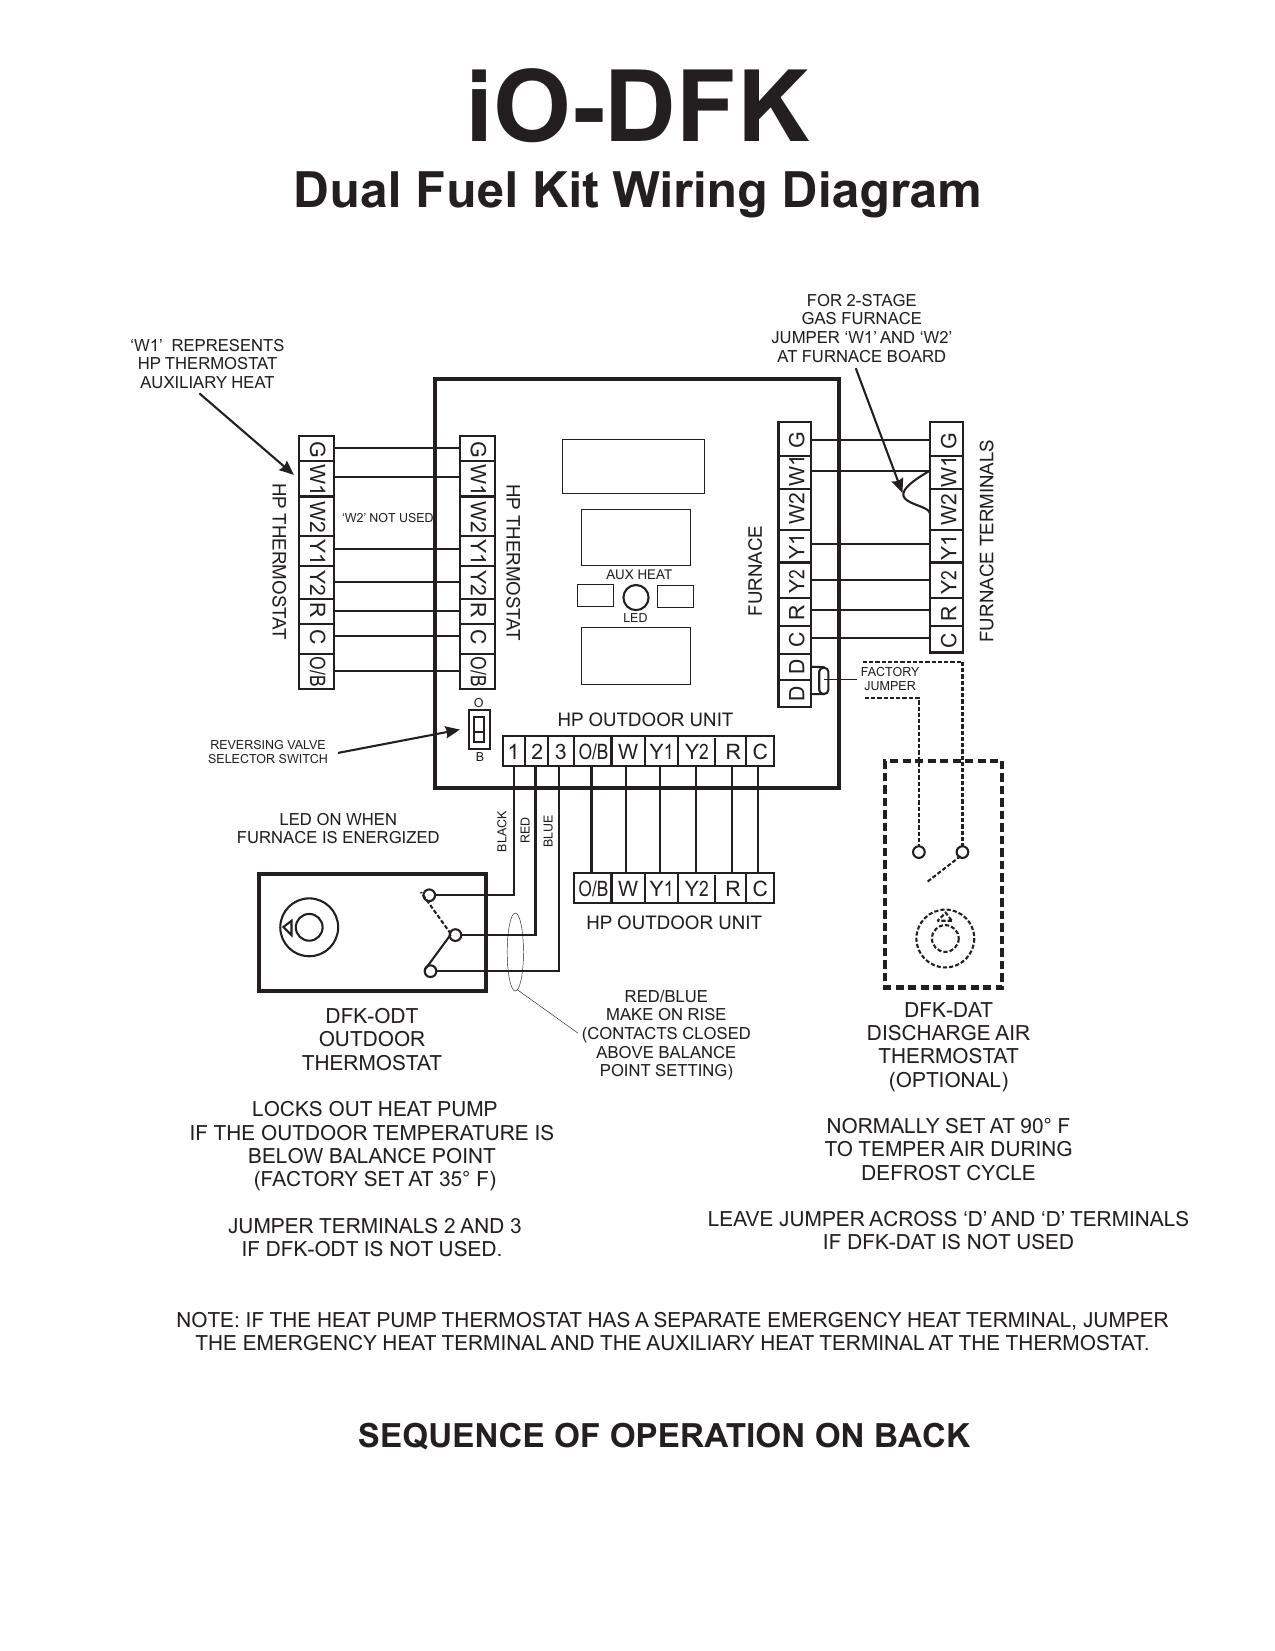 dual fuel furnace wiring diagram io dfk installation sheet cdr manualzz  io dfk installation sheet cdr manualzz